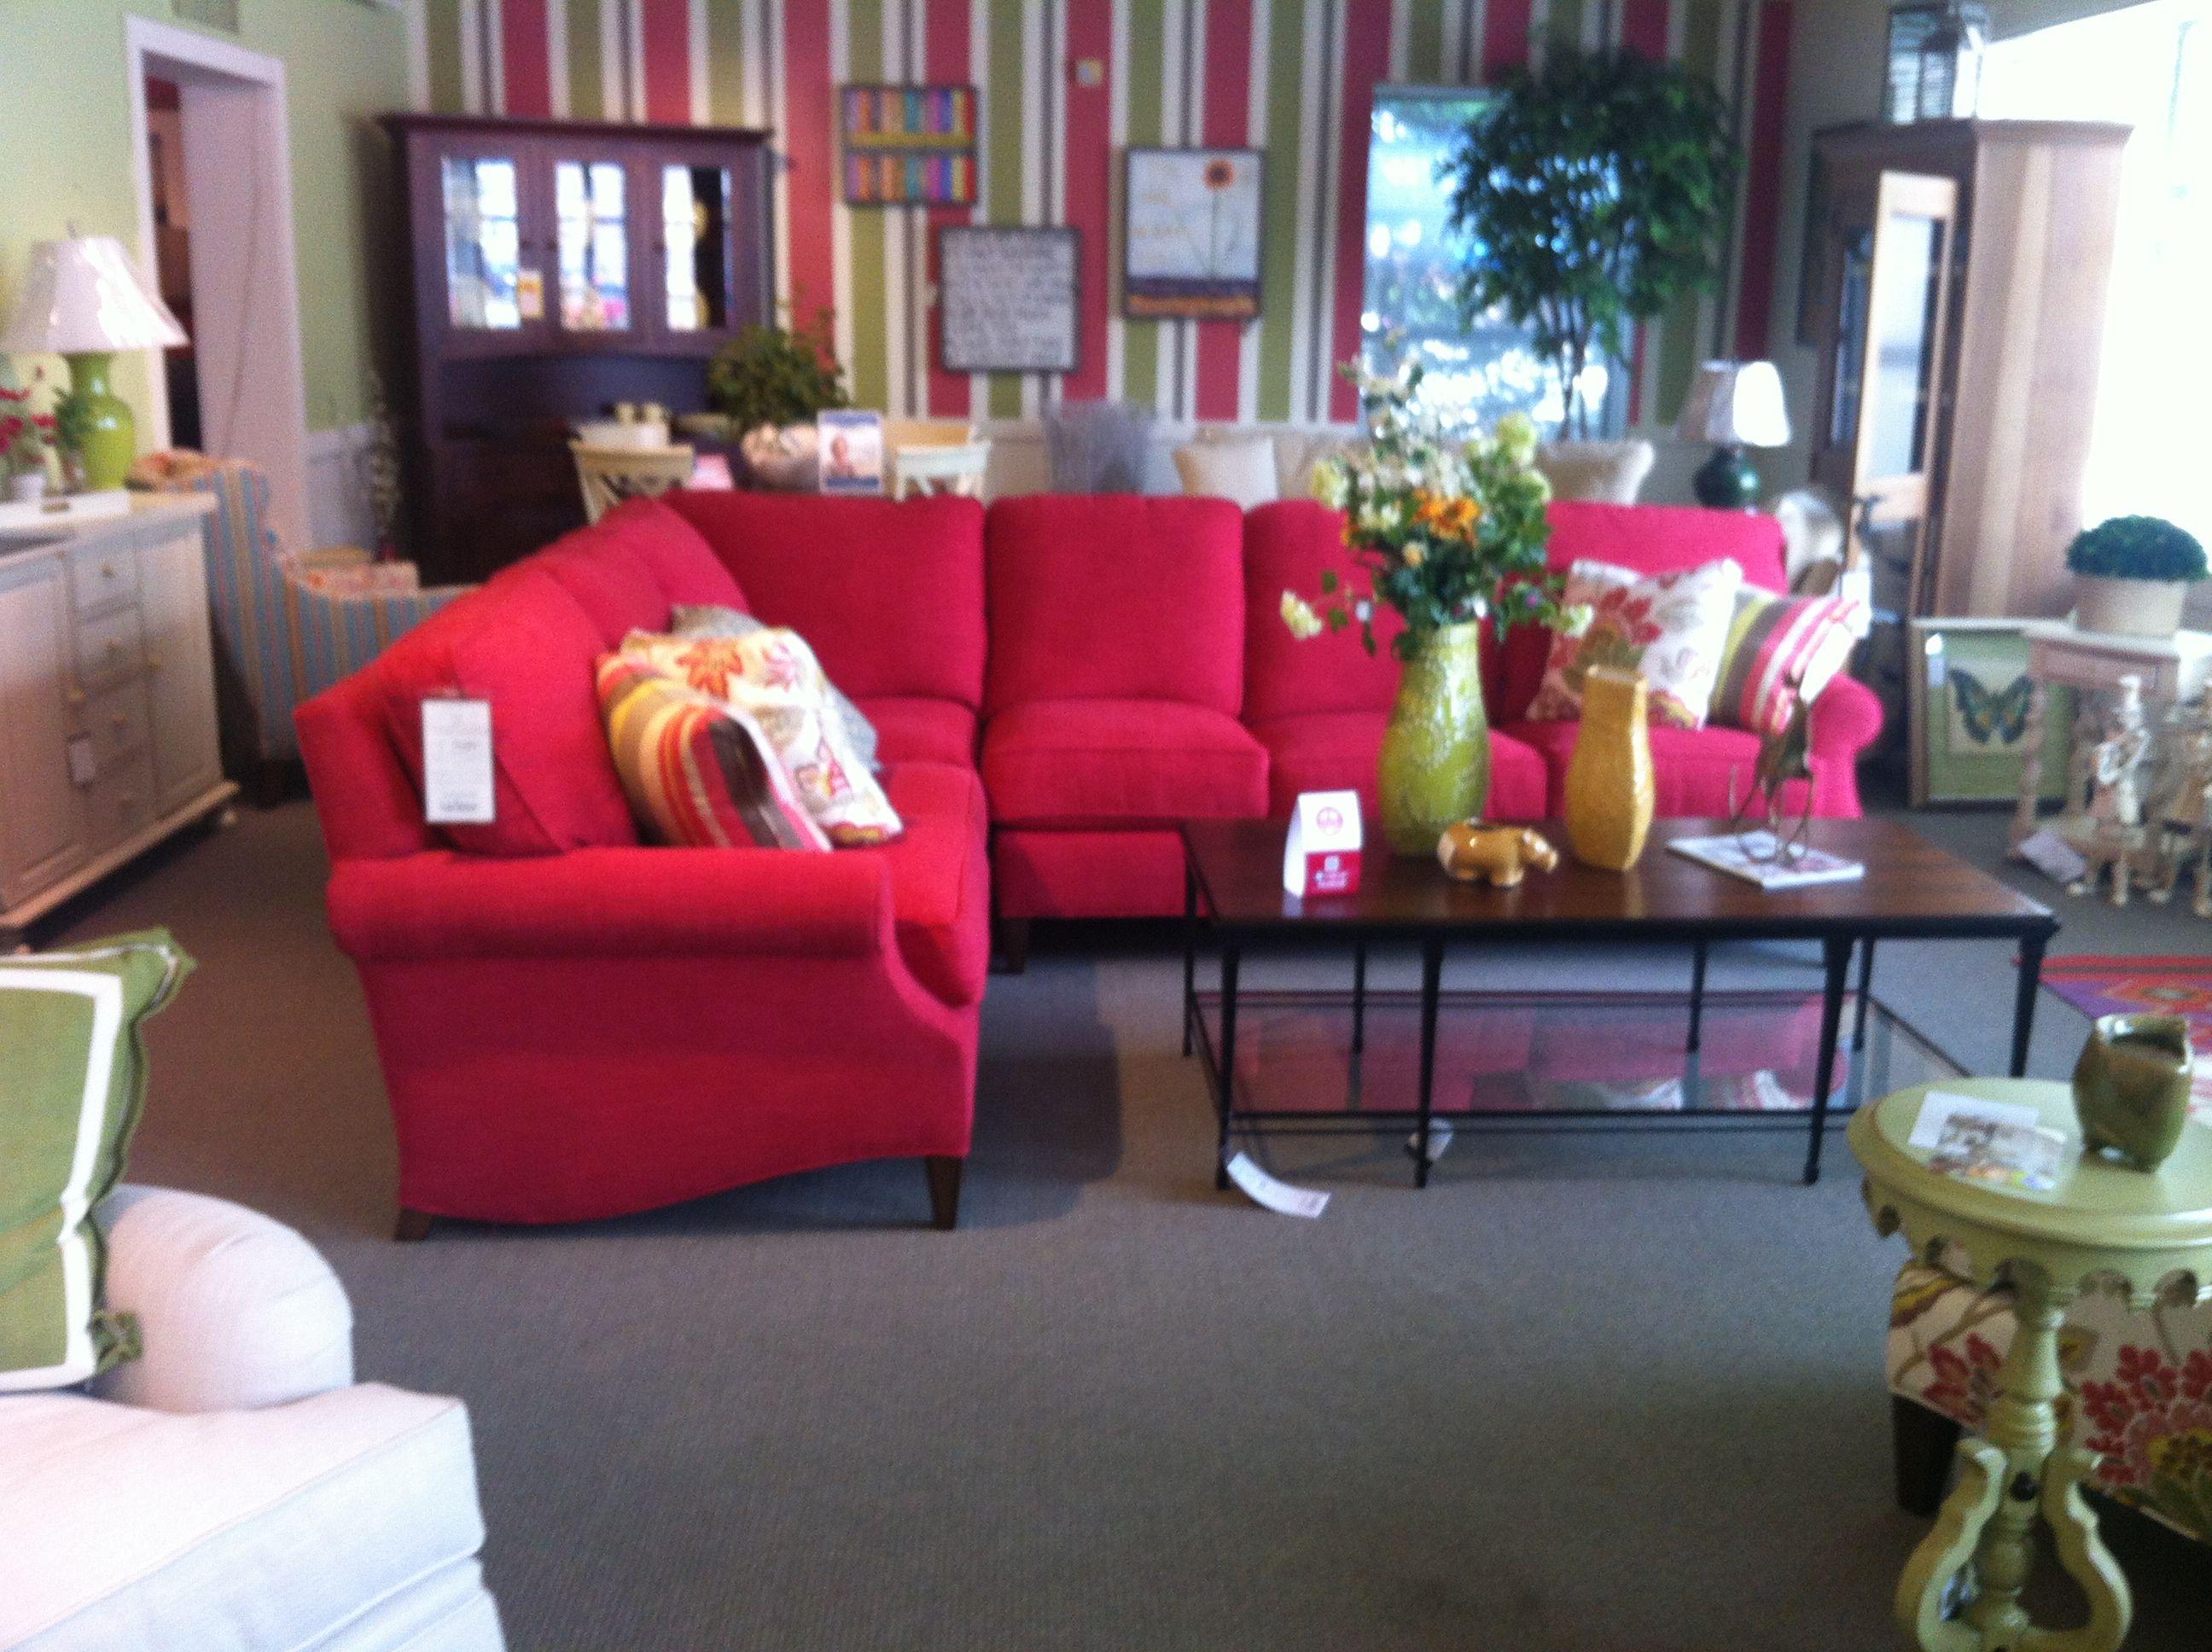 Beau La Chance Furniture Gardner, MA